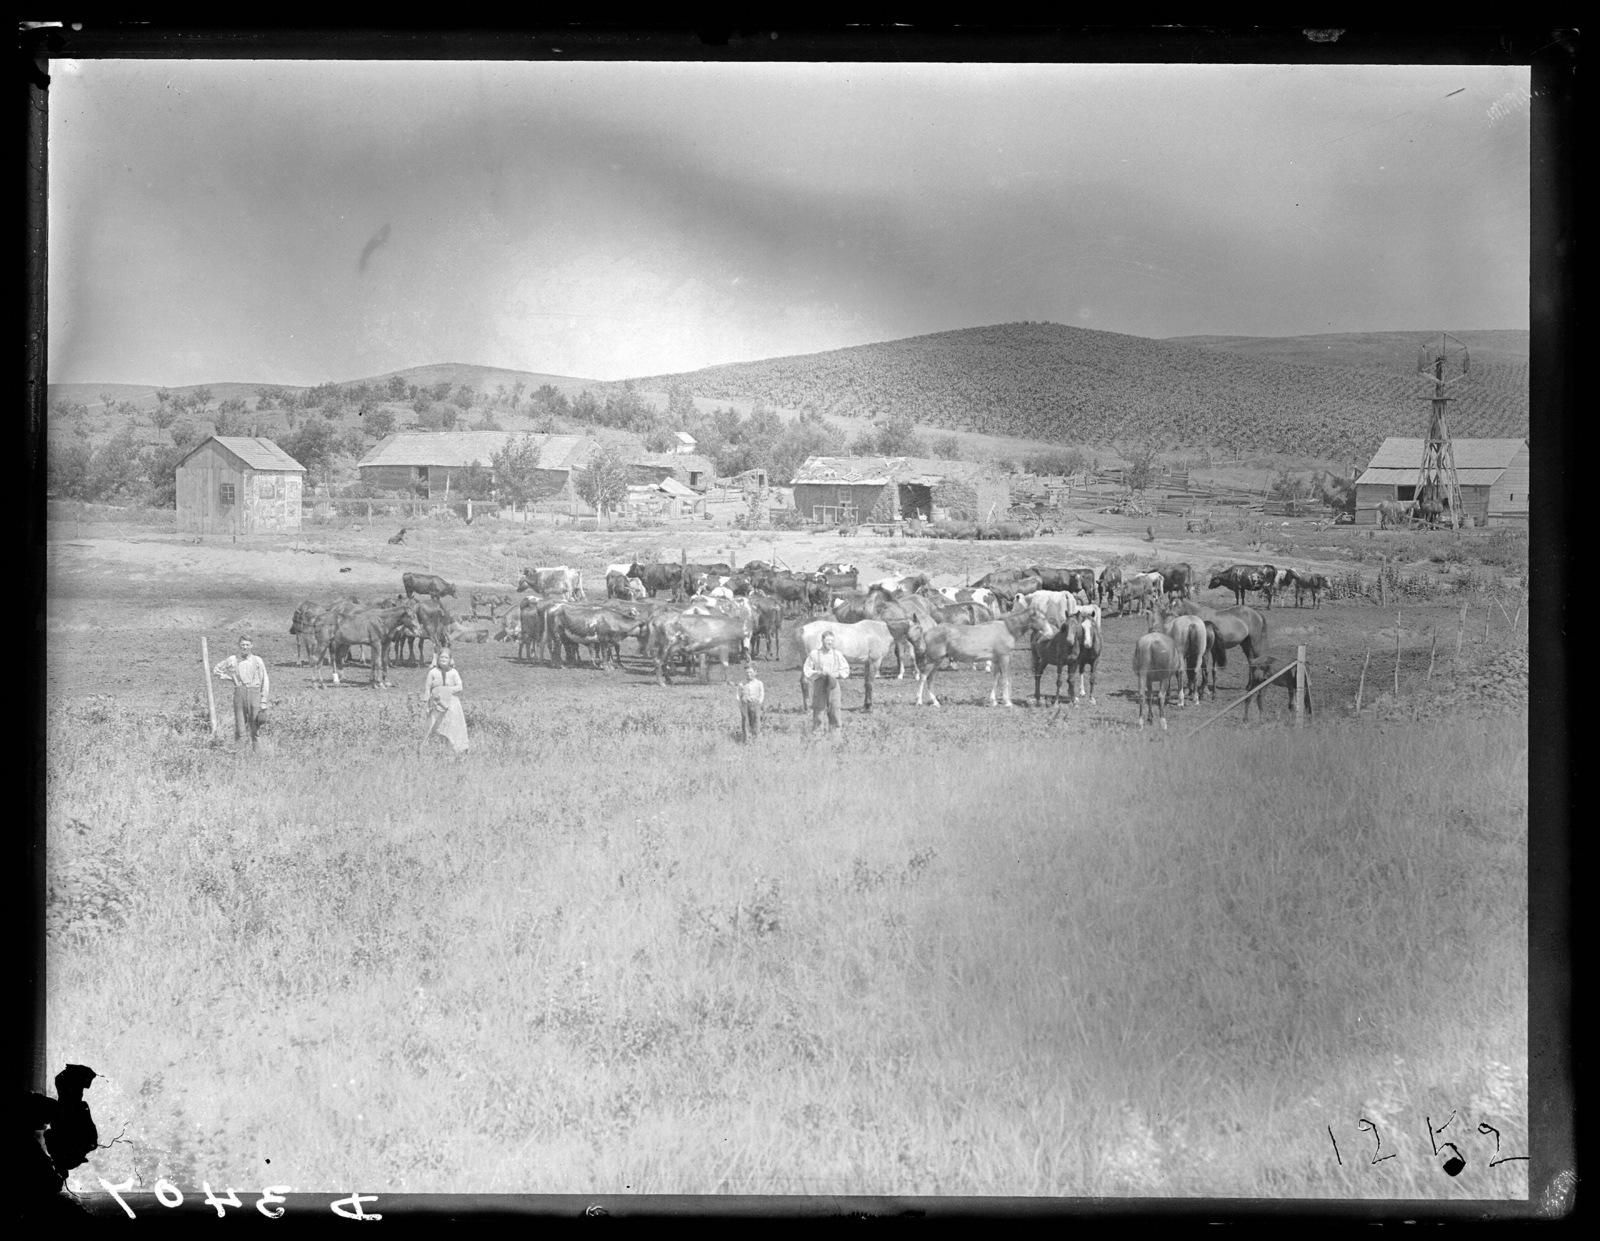 Mahot ranch six miles north of Broken Bow, Custer County, Nebraska